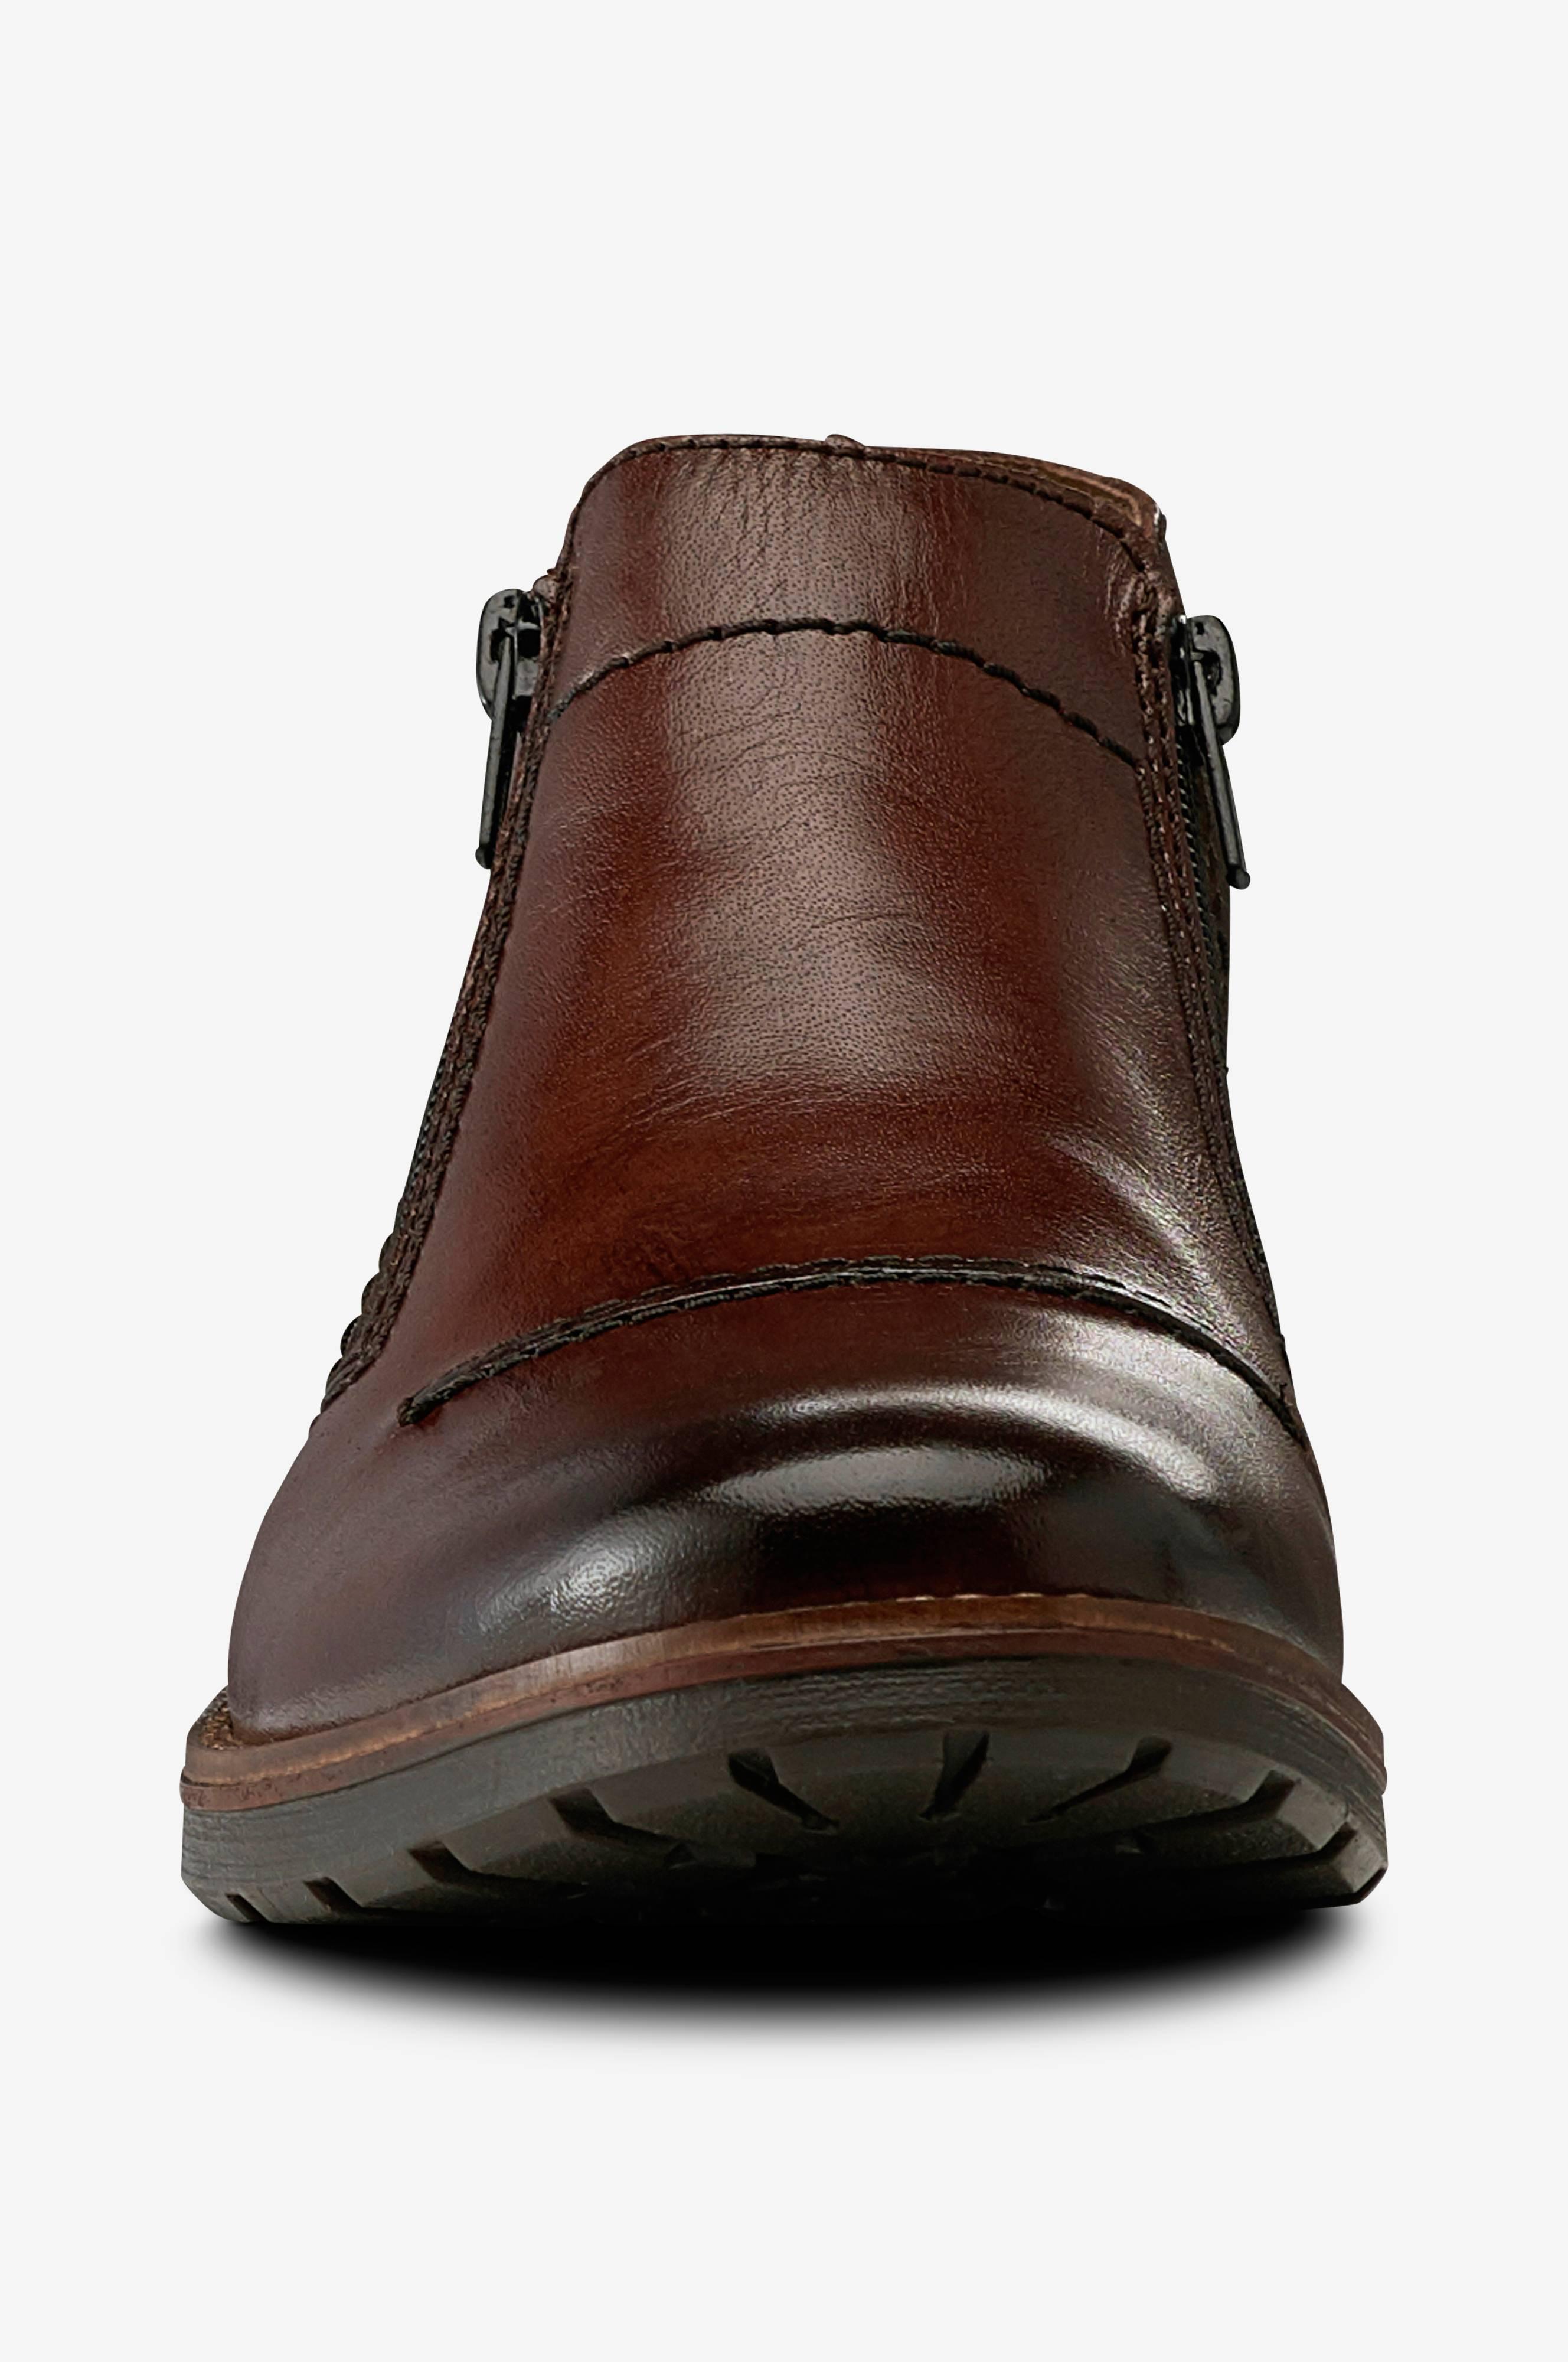 Rieker Boots, varmfodrade i ull Brun Boots Ellos.se